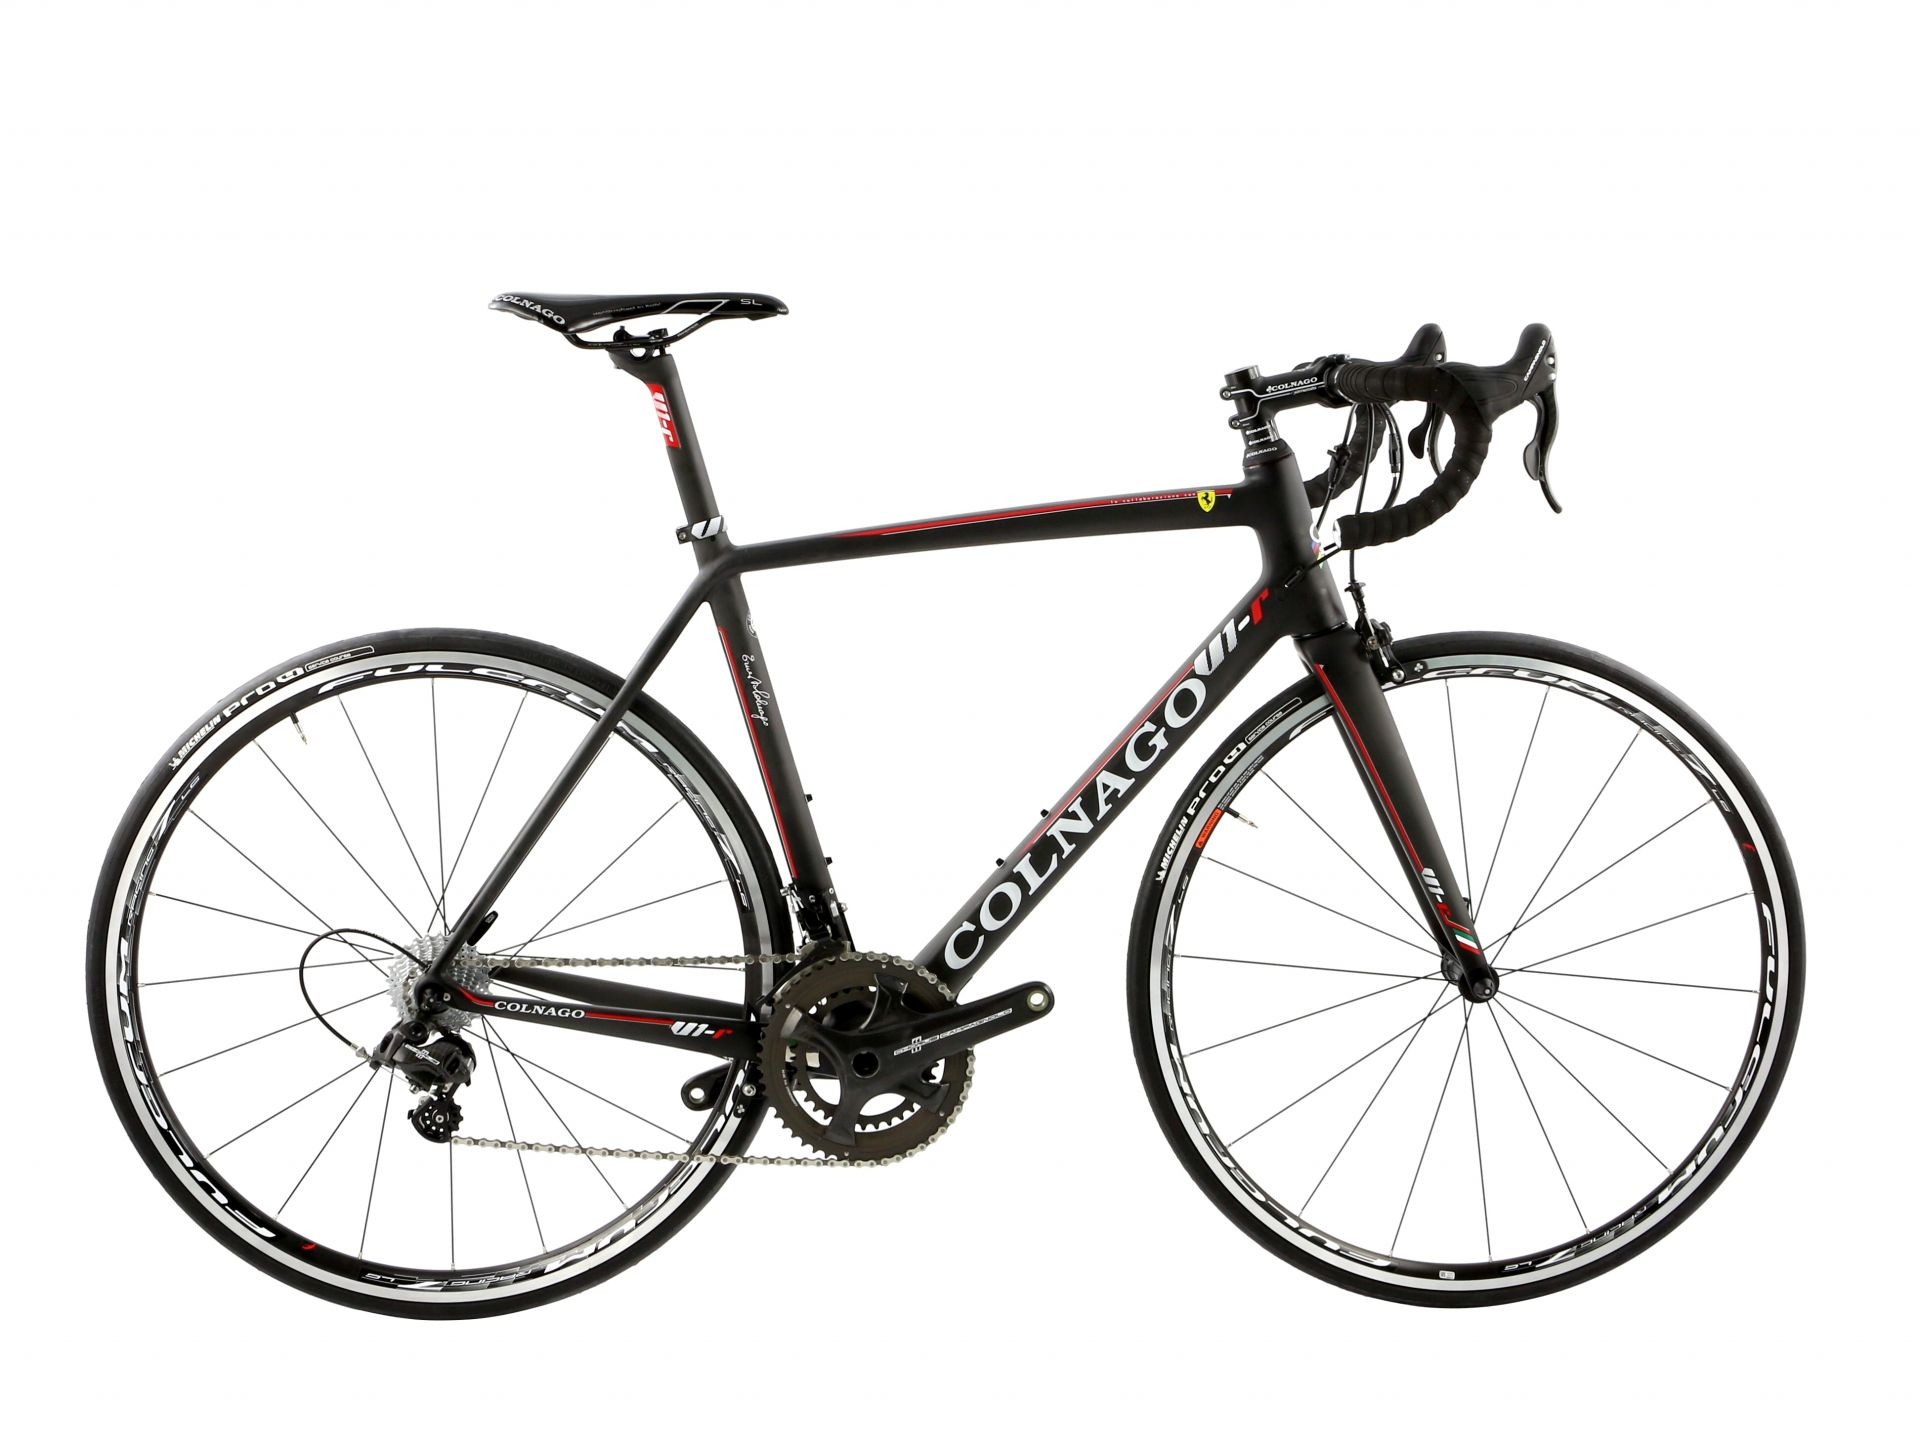 Vélo Colnago V1-r Campagnolo Chorus 11V Fulcrum Racing 7 (UNRD) - 520S